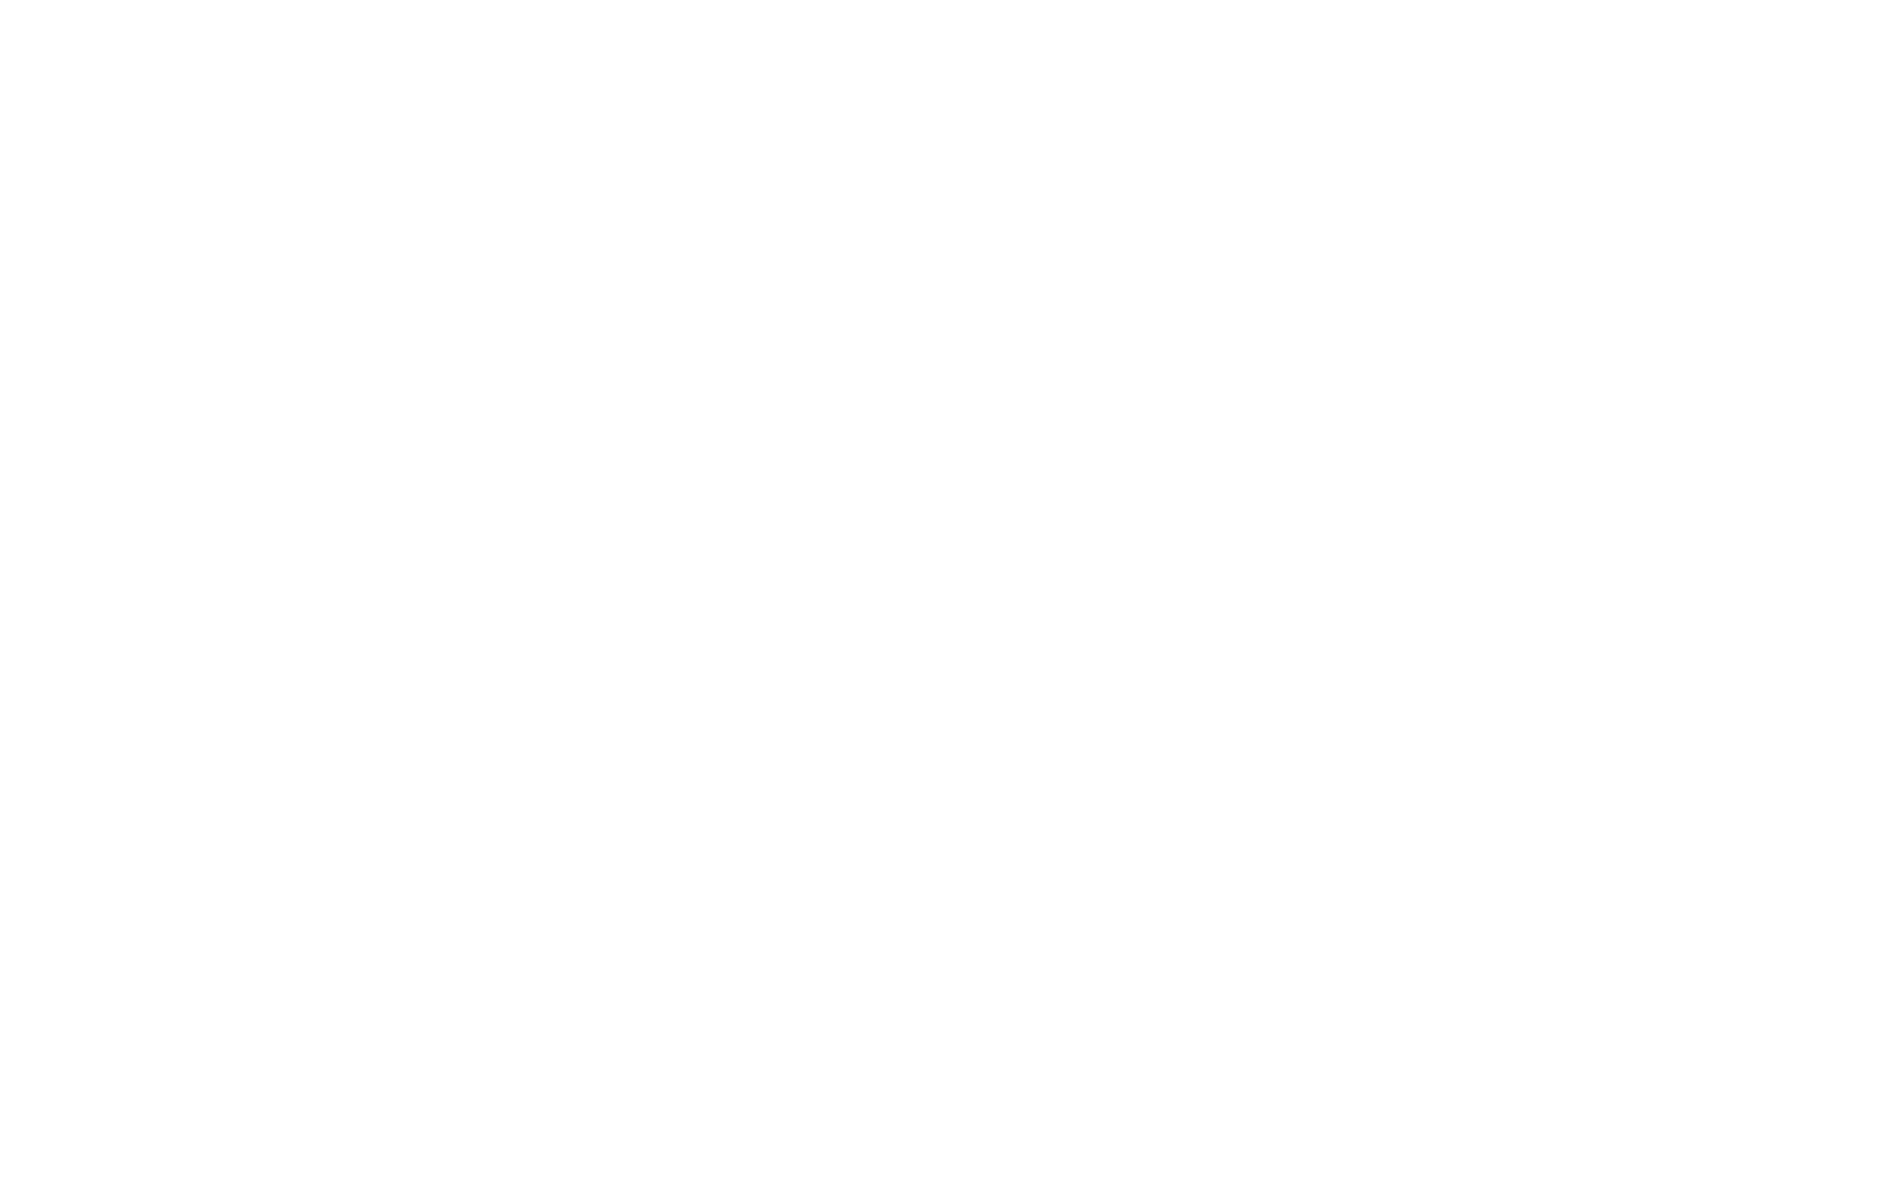 C203 cope and stick cabinet door configuration